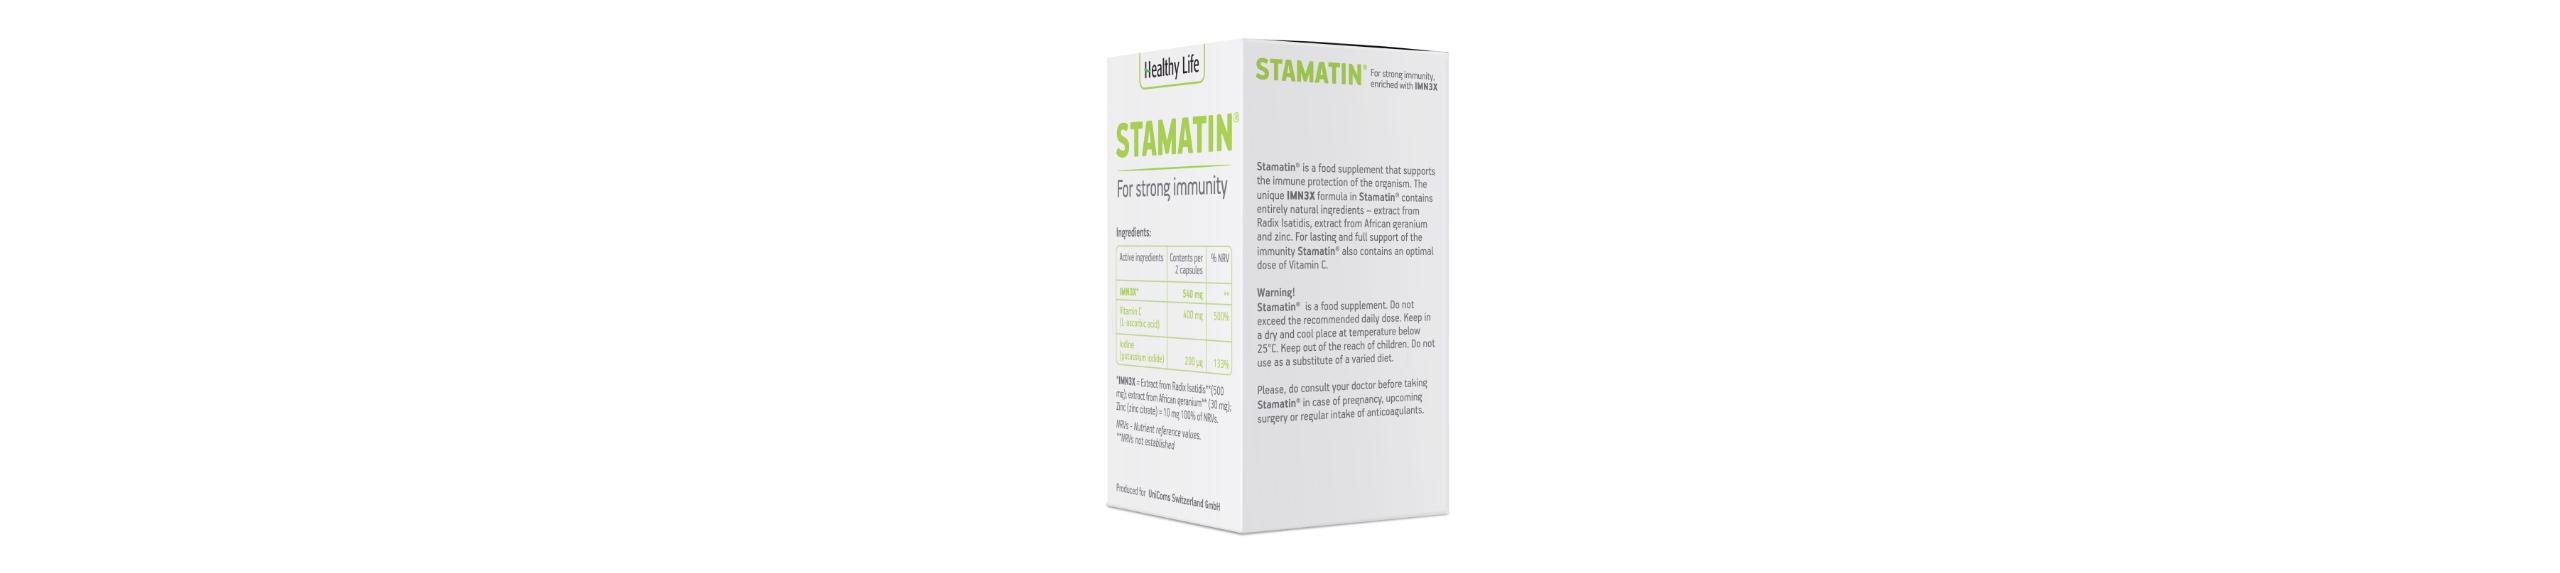 P3-Slider-img-Stamatin4